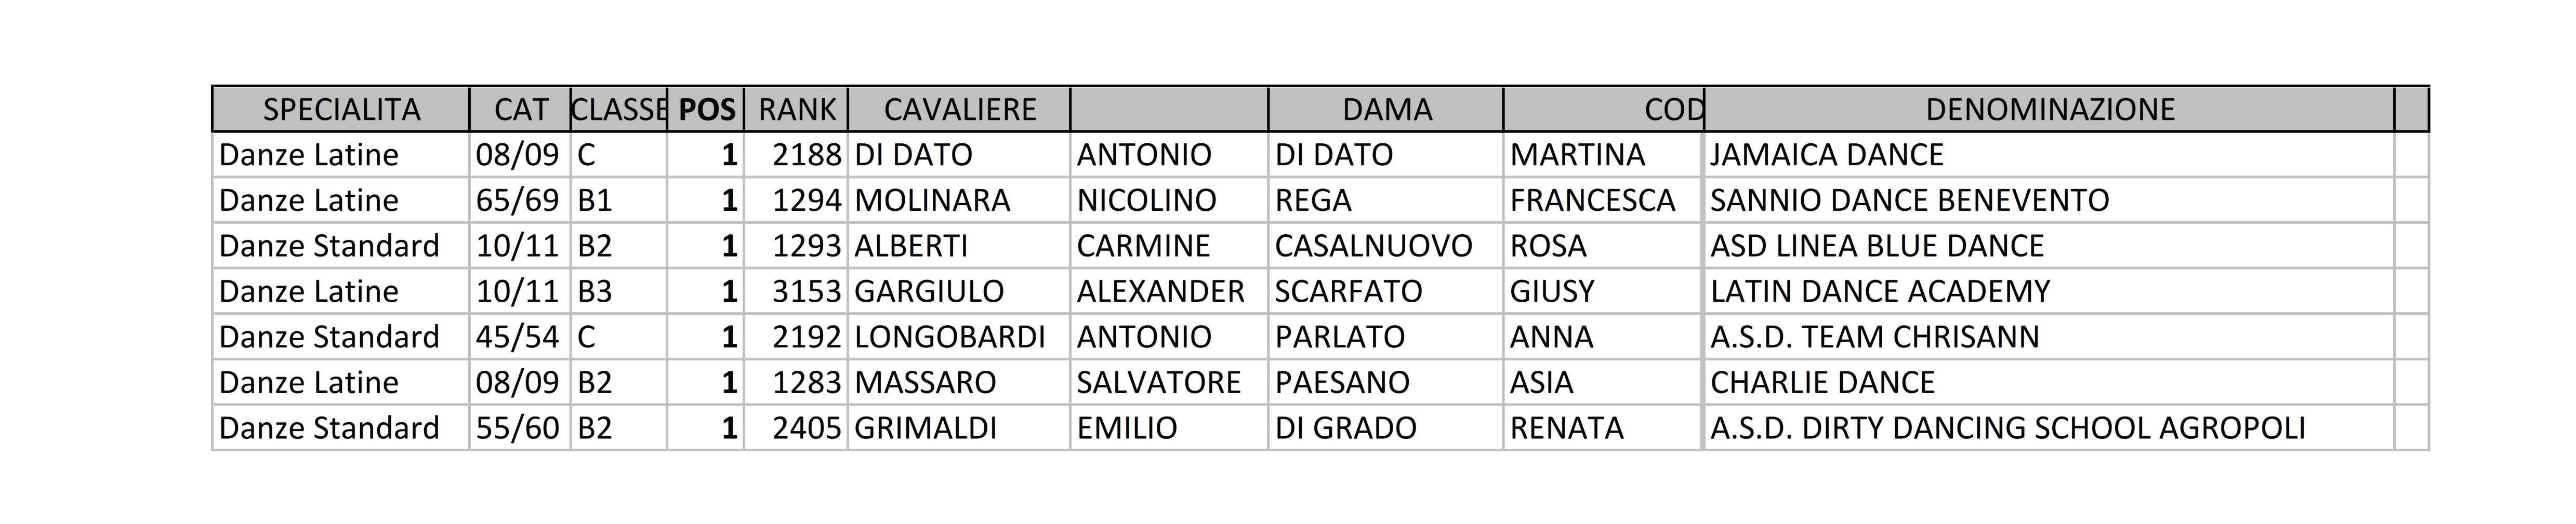 Campania RAKING_001-1